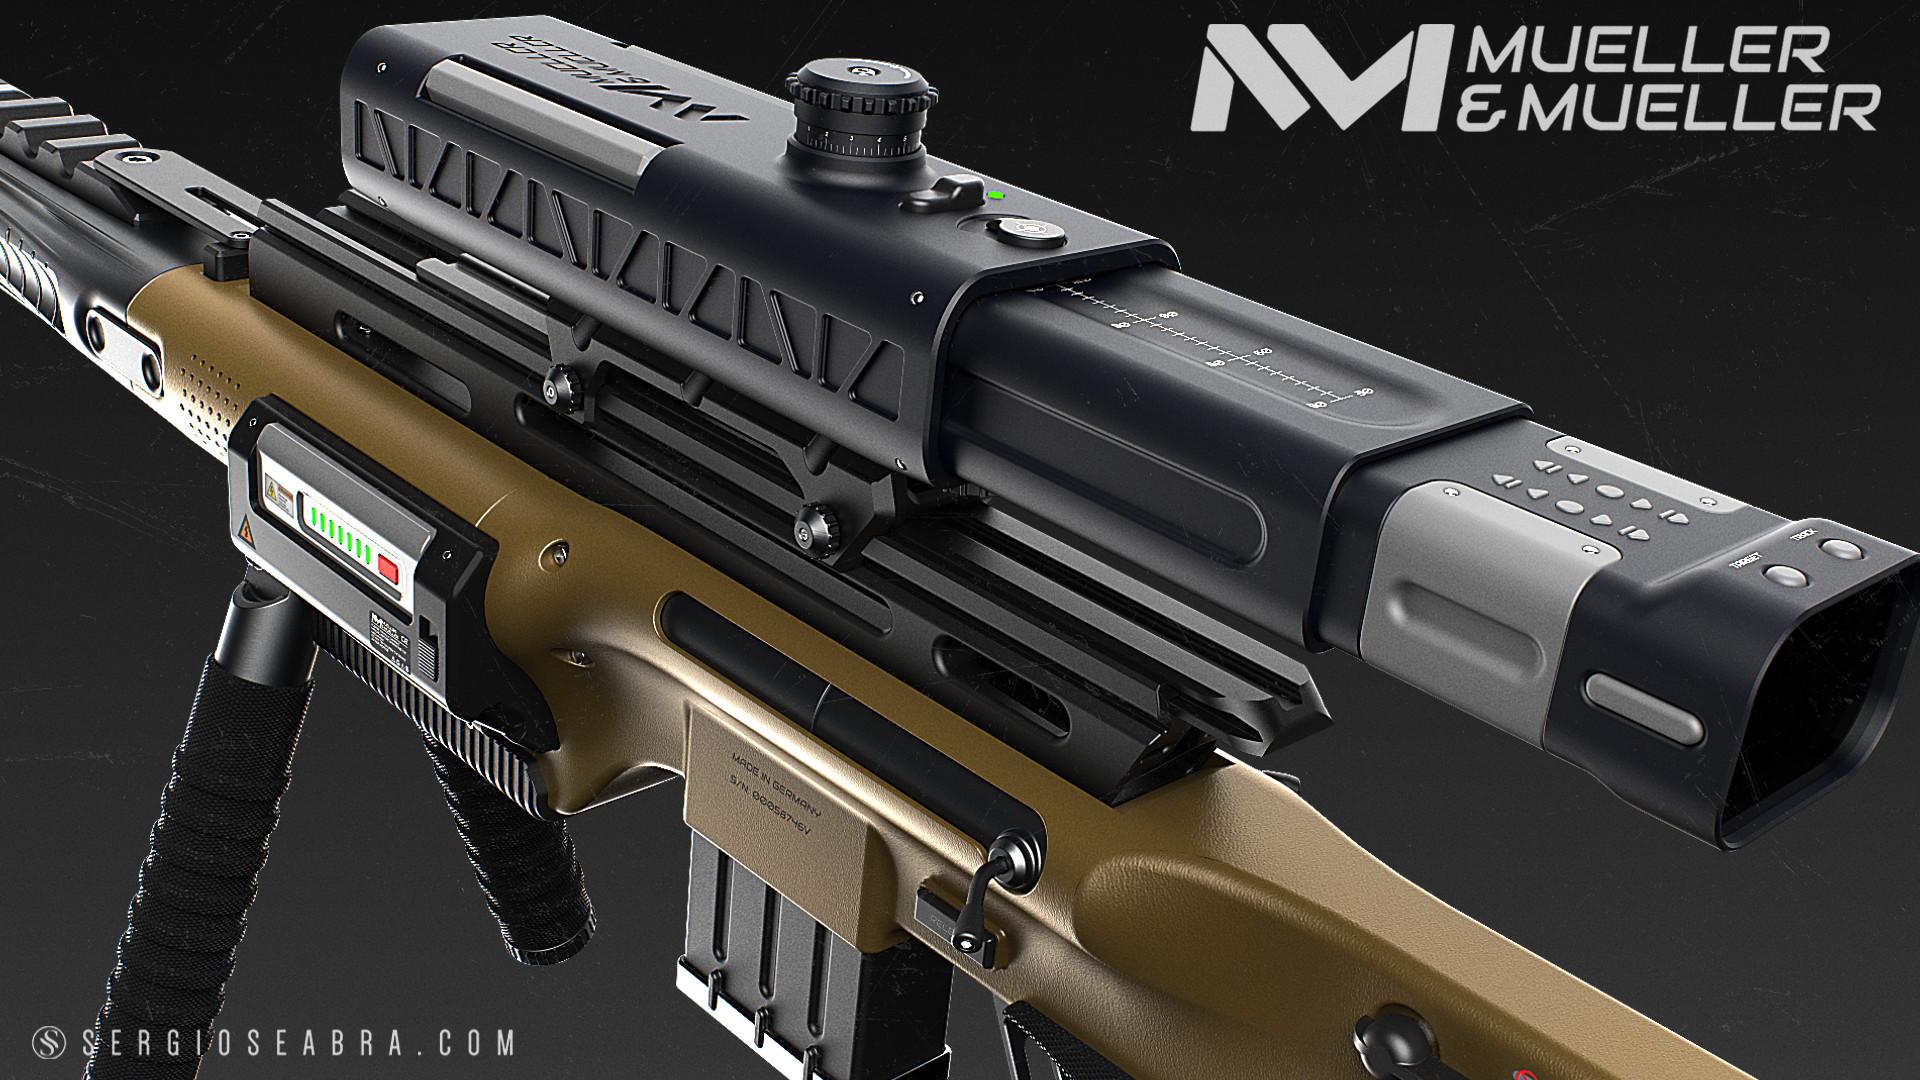 Sergio seabra 20180205 prop phantom twins sniper rifle layouts2